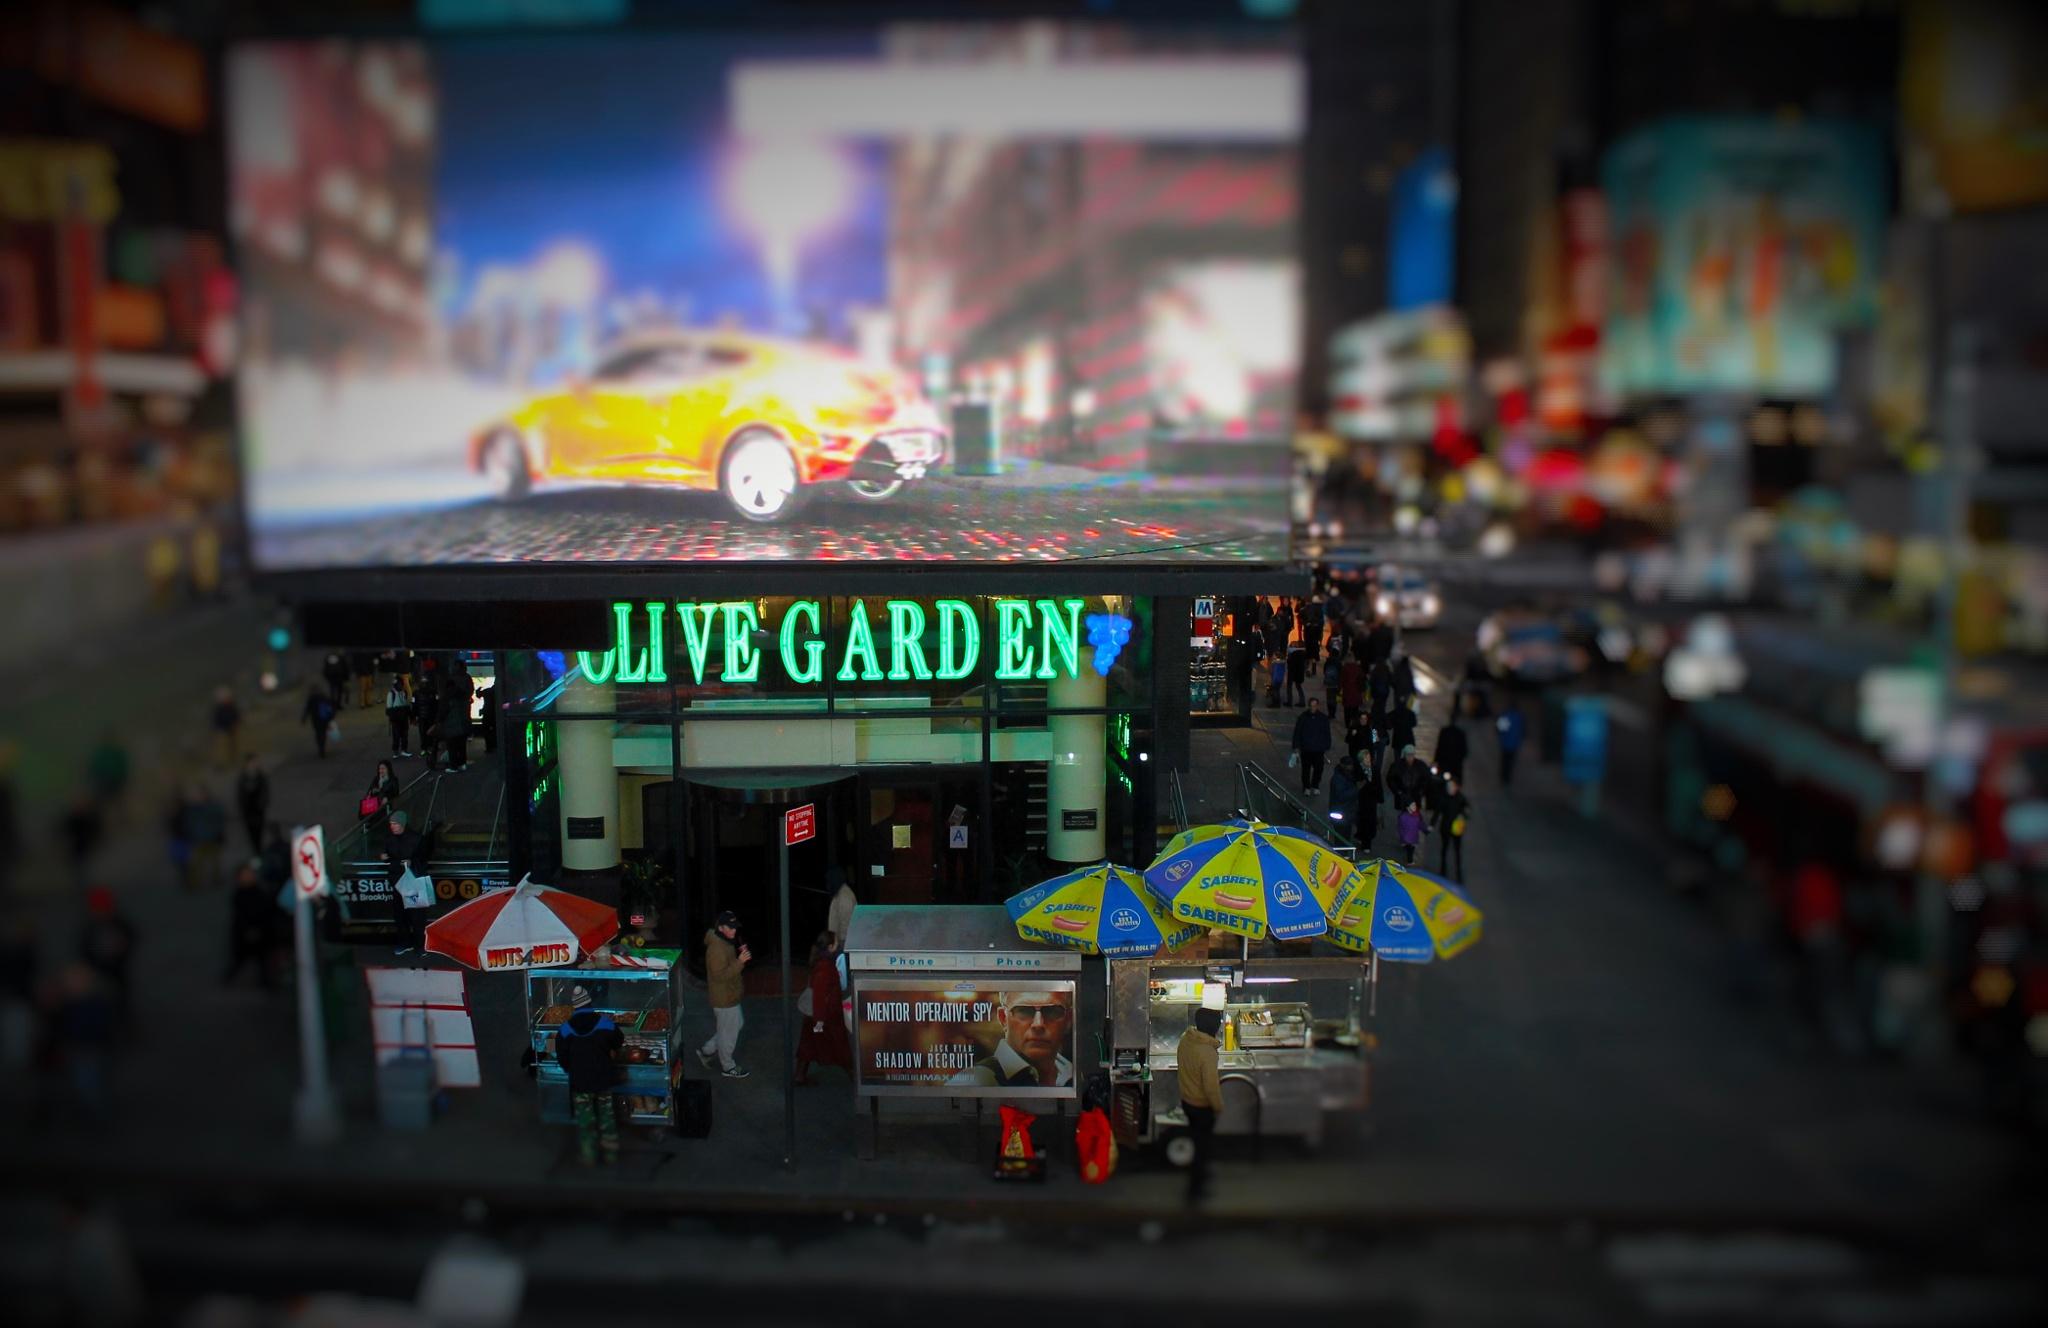 OLIVE GARDEN on Broadway by Liborio Drogo